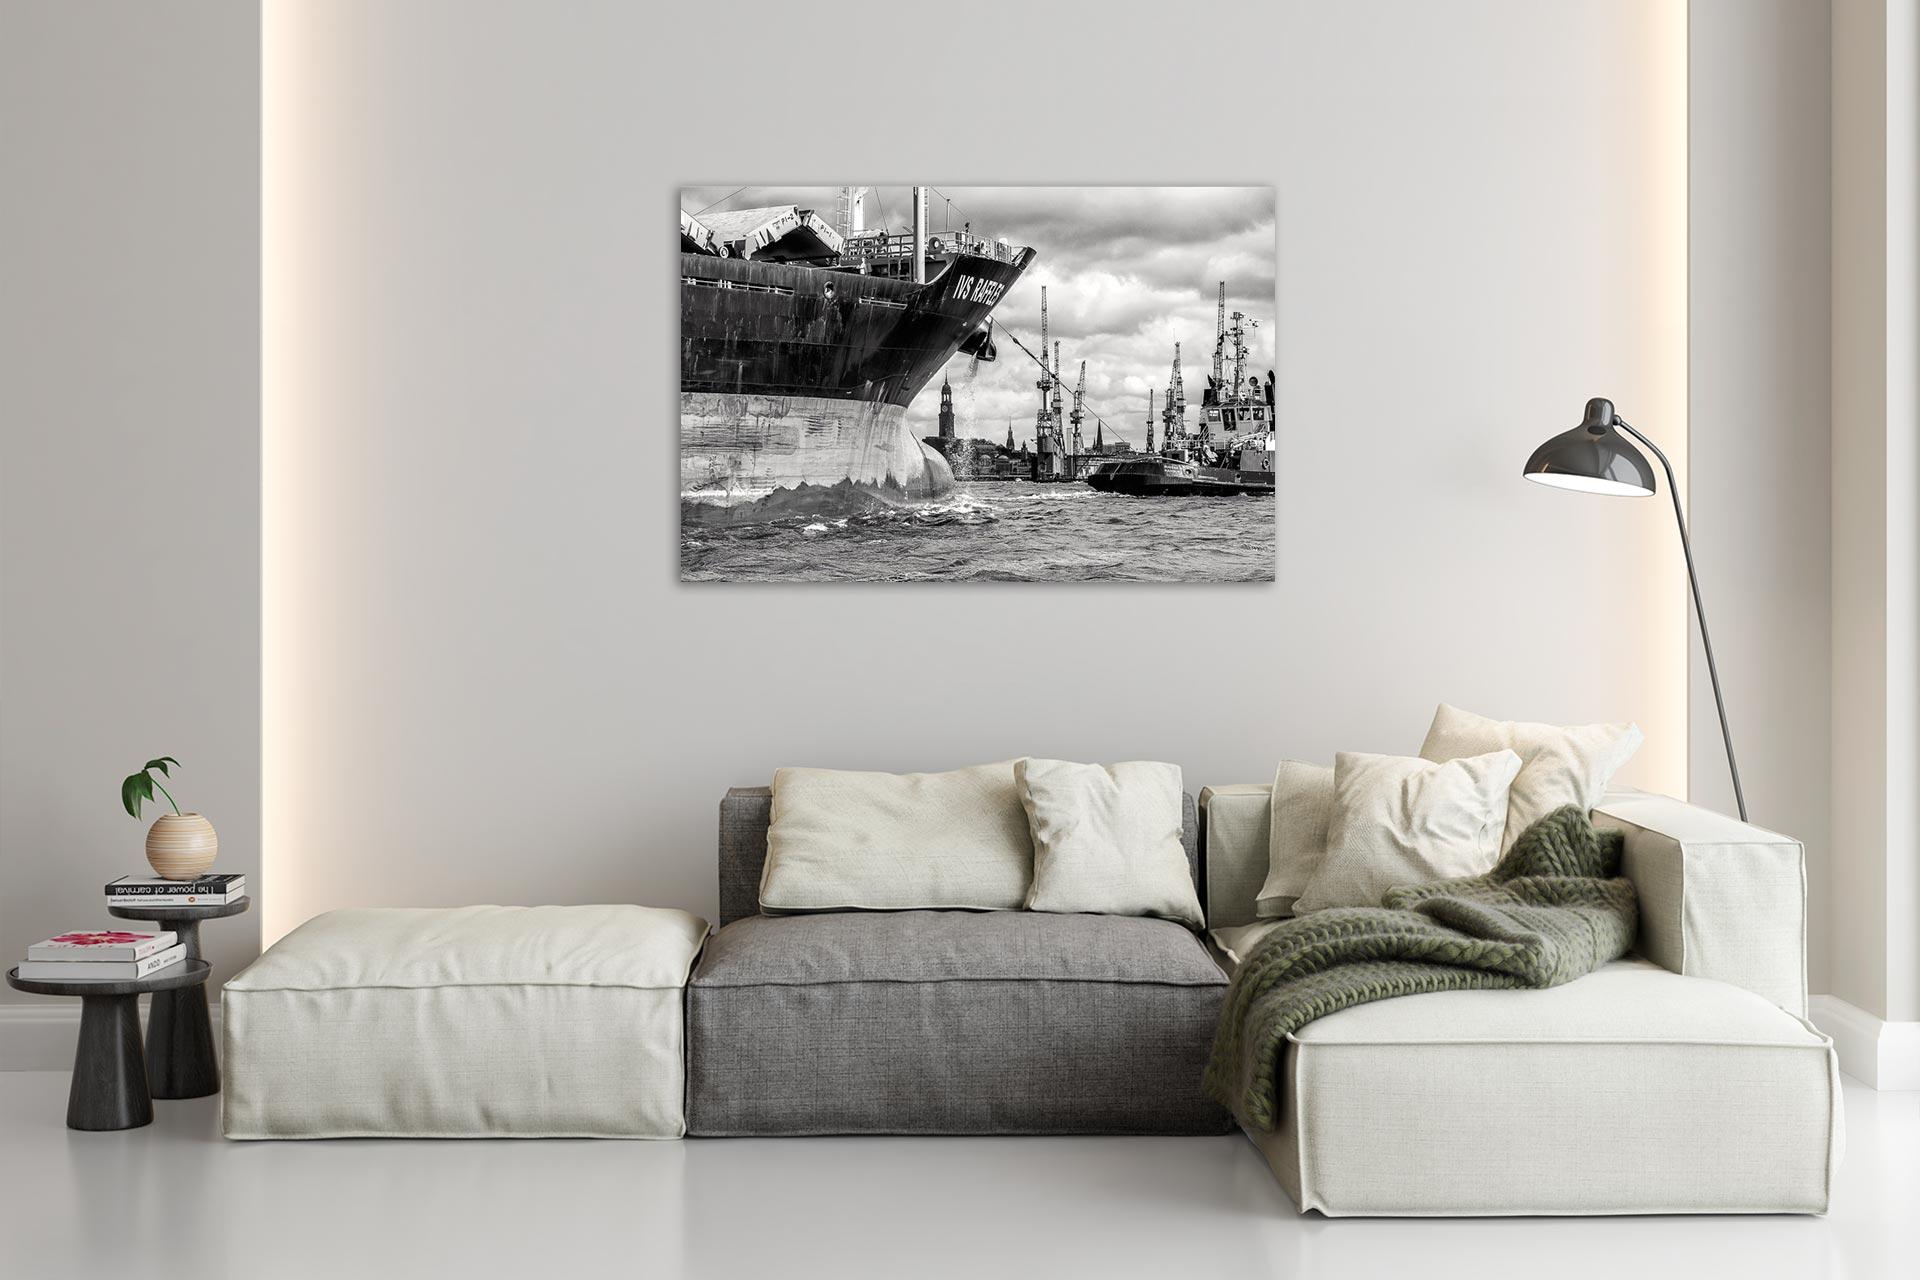 LSW095-kurs-hamburg-wandbild-auf-leinwand-acrylglas-aludibond-wohnzimmer